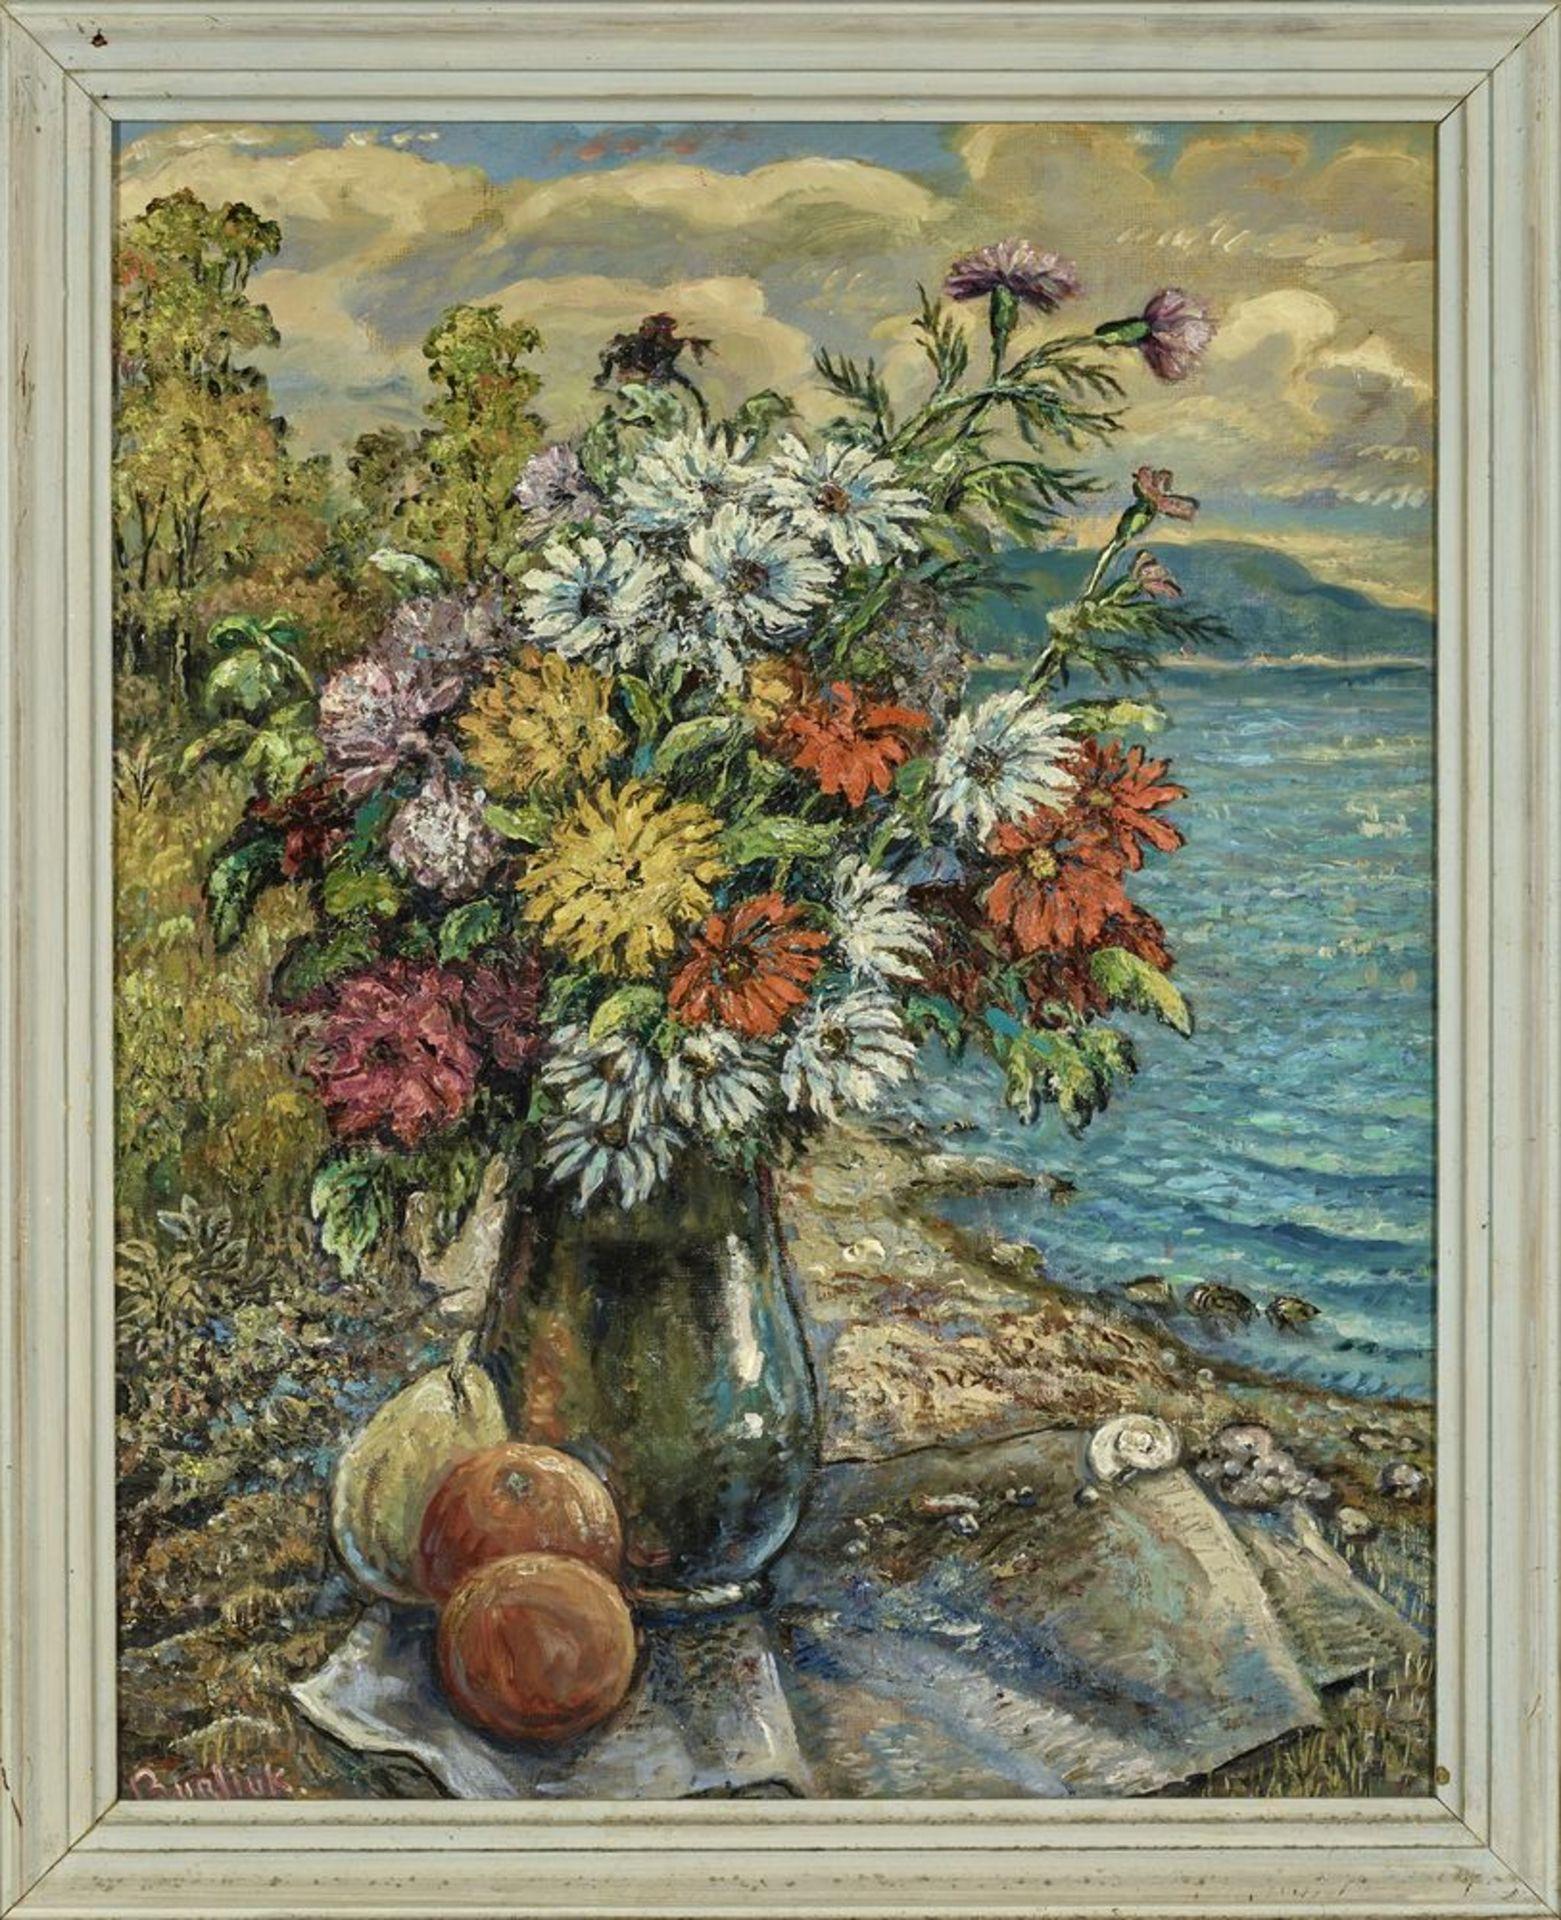 Los 24 - David Burliuk (1882 – 1967) - Flowers and fruits on a beach Signed 'Burliuk' [...]